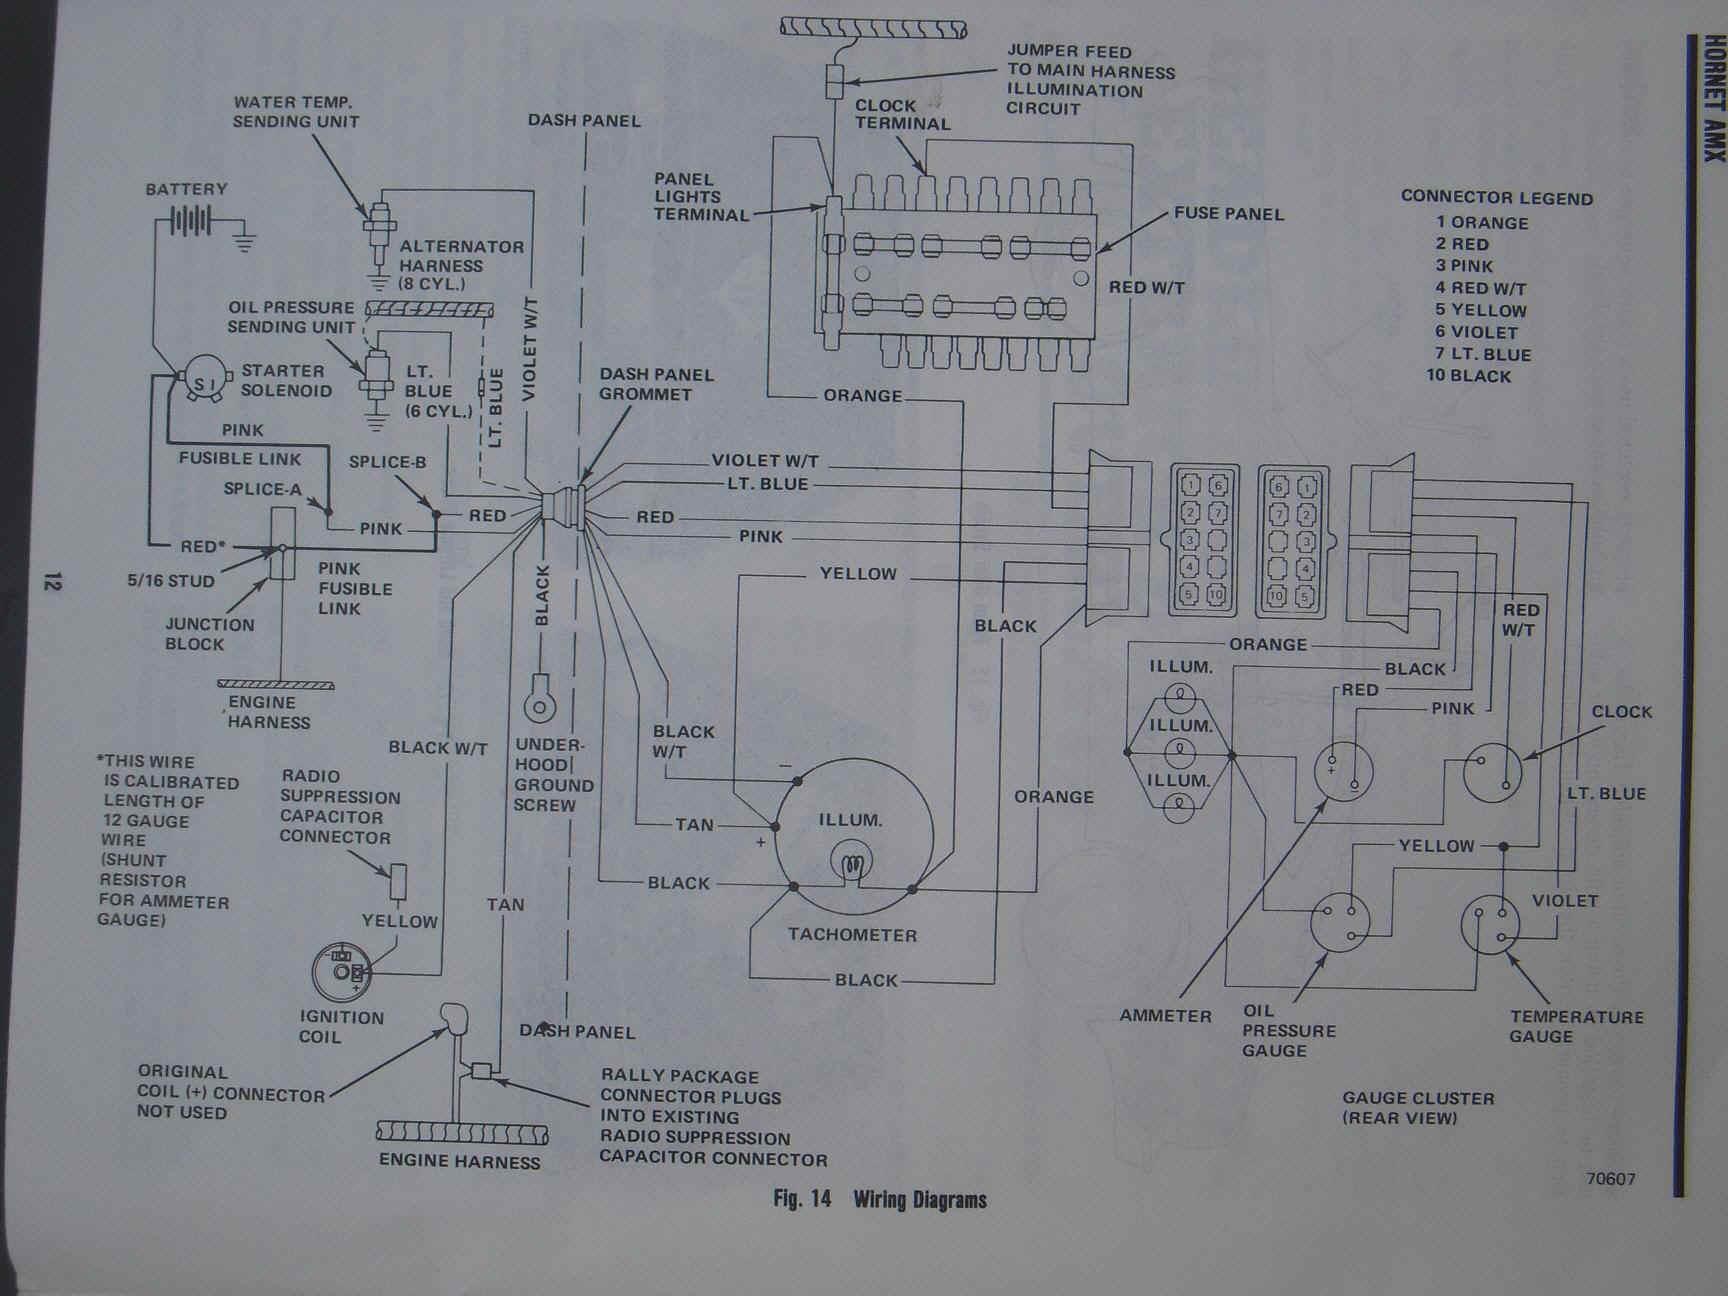 72 Amc Javelin Wiring Diagram Wiring Diagrams Box Insteon Wiring Diagram  Amx Wiring Diagram